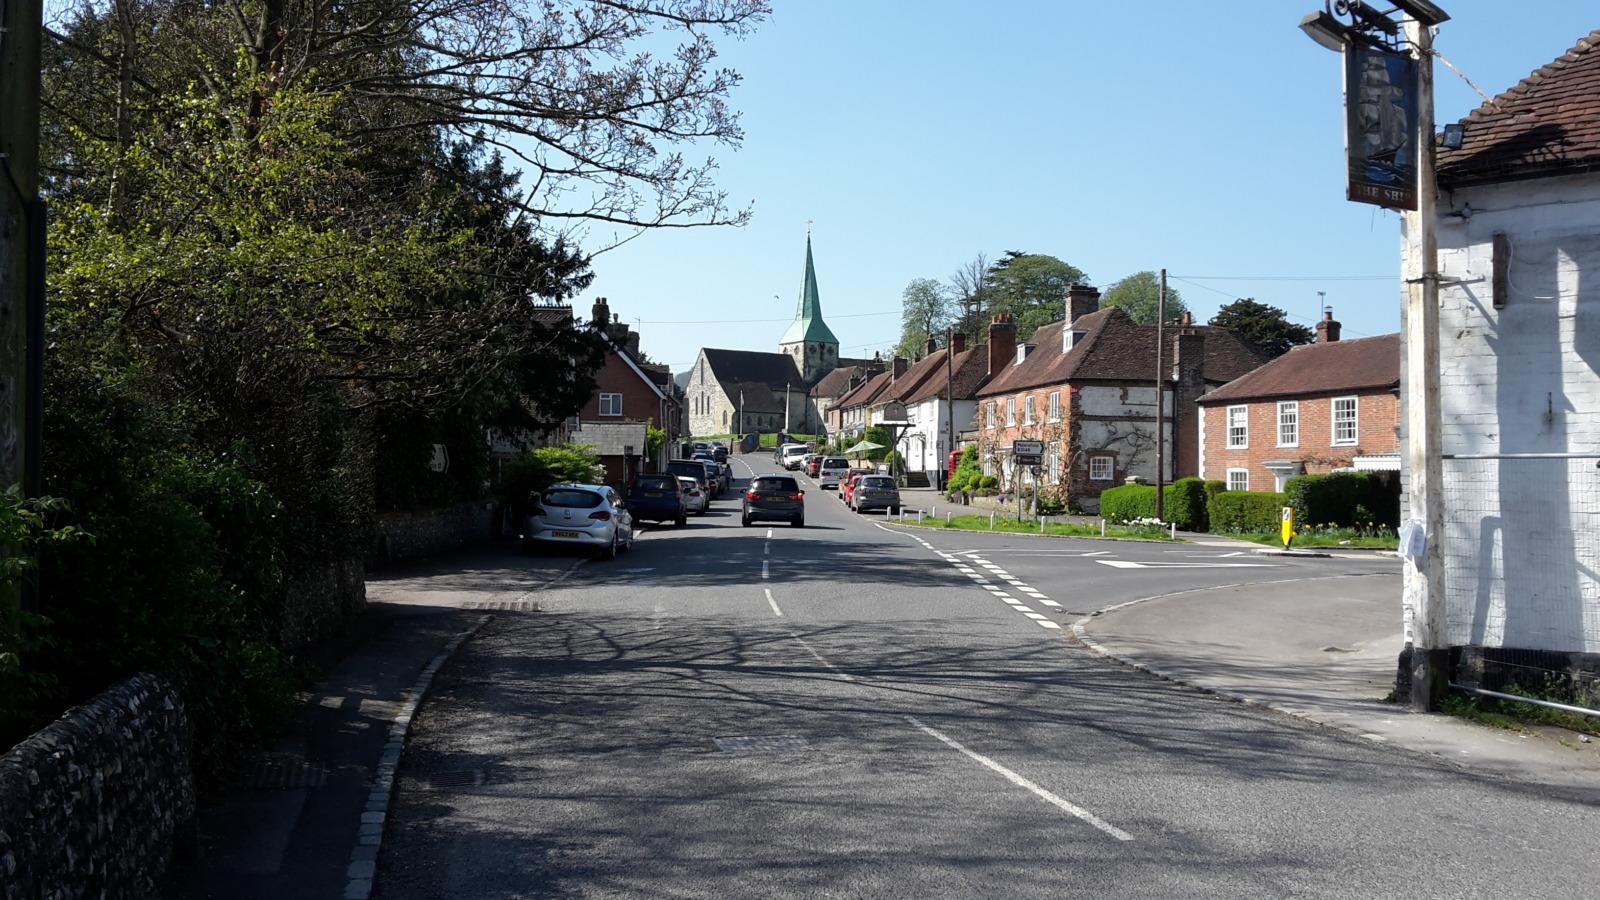 South Harting village